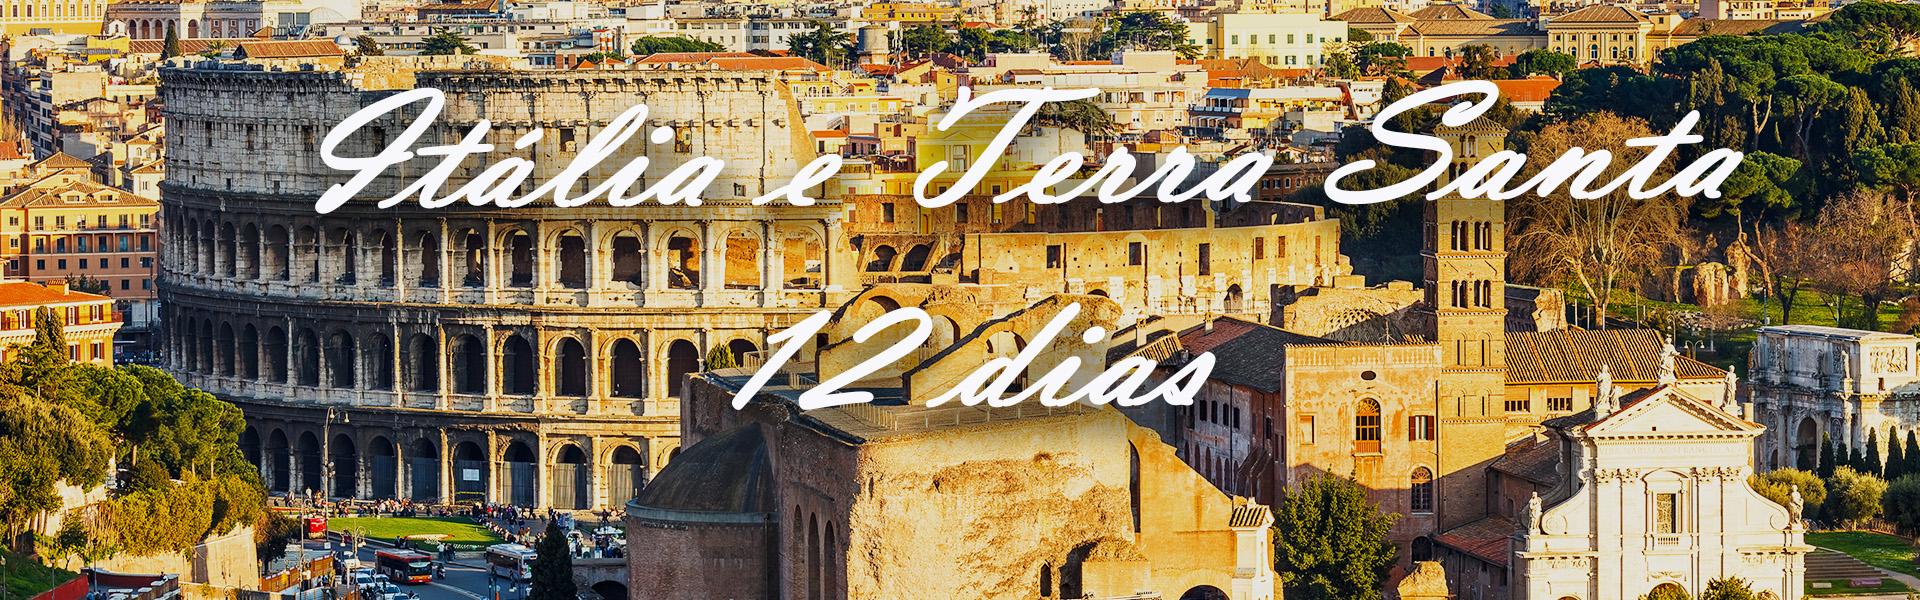 Roteiro de Itália e Terra Santa